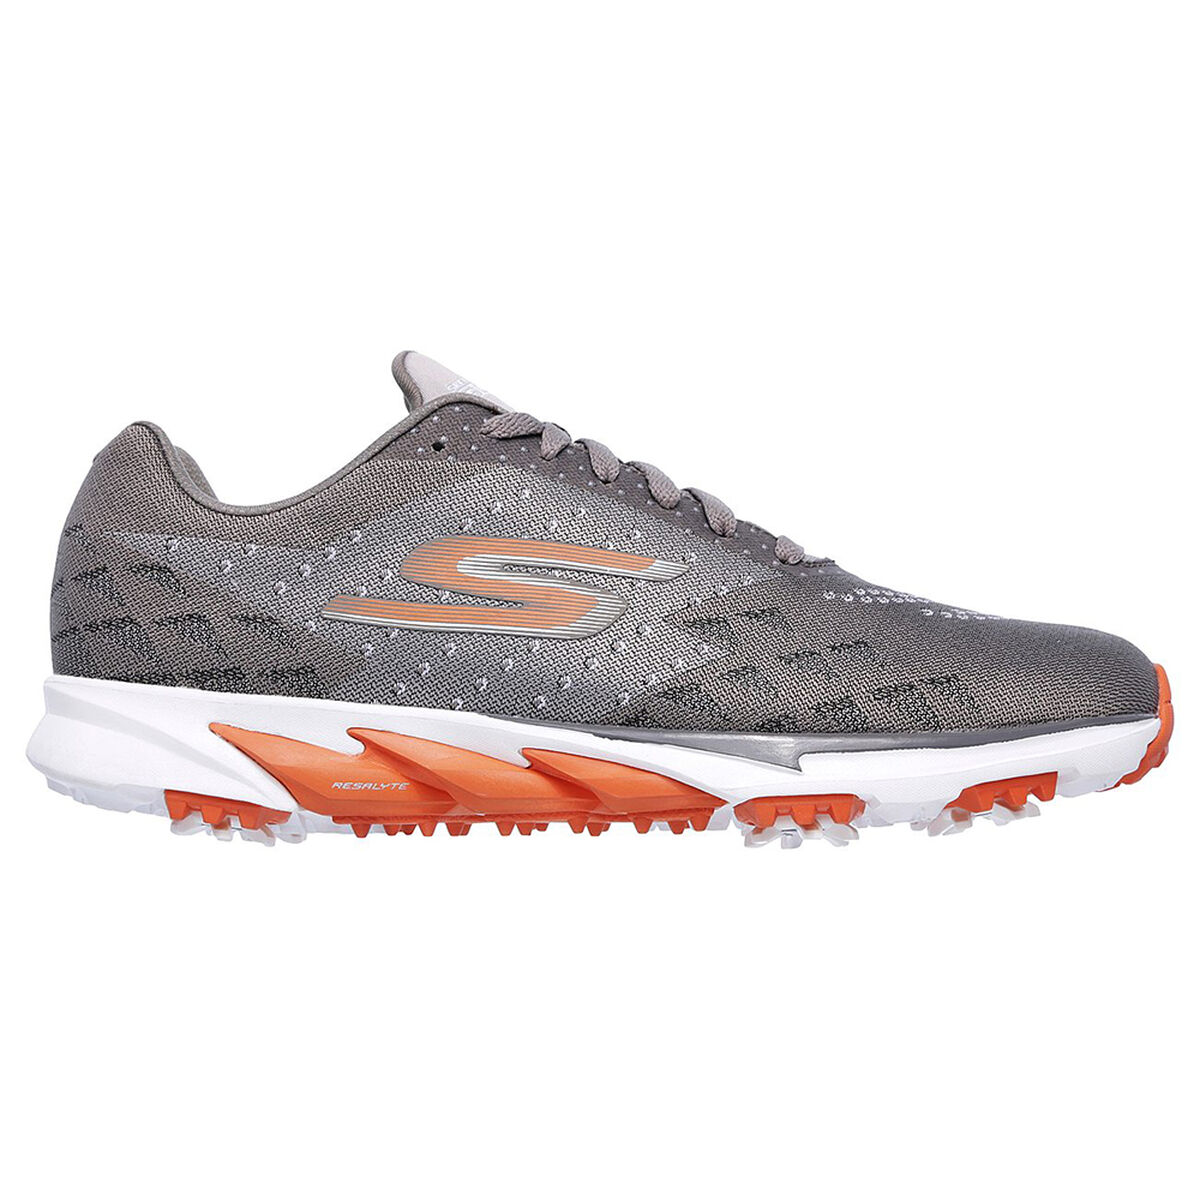 06c34bbcf3d2 Skechers GO GOLF Blade 2 Men s Golf Shoe - Charcoal Orange